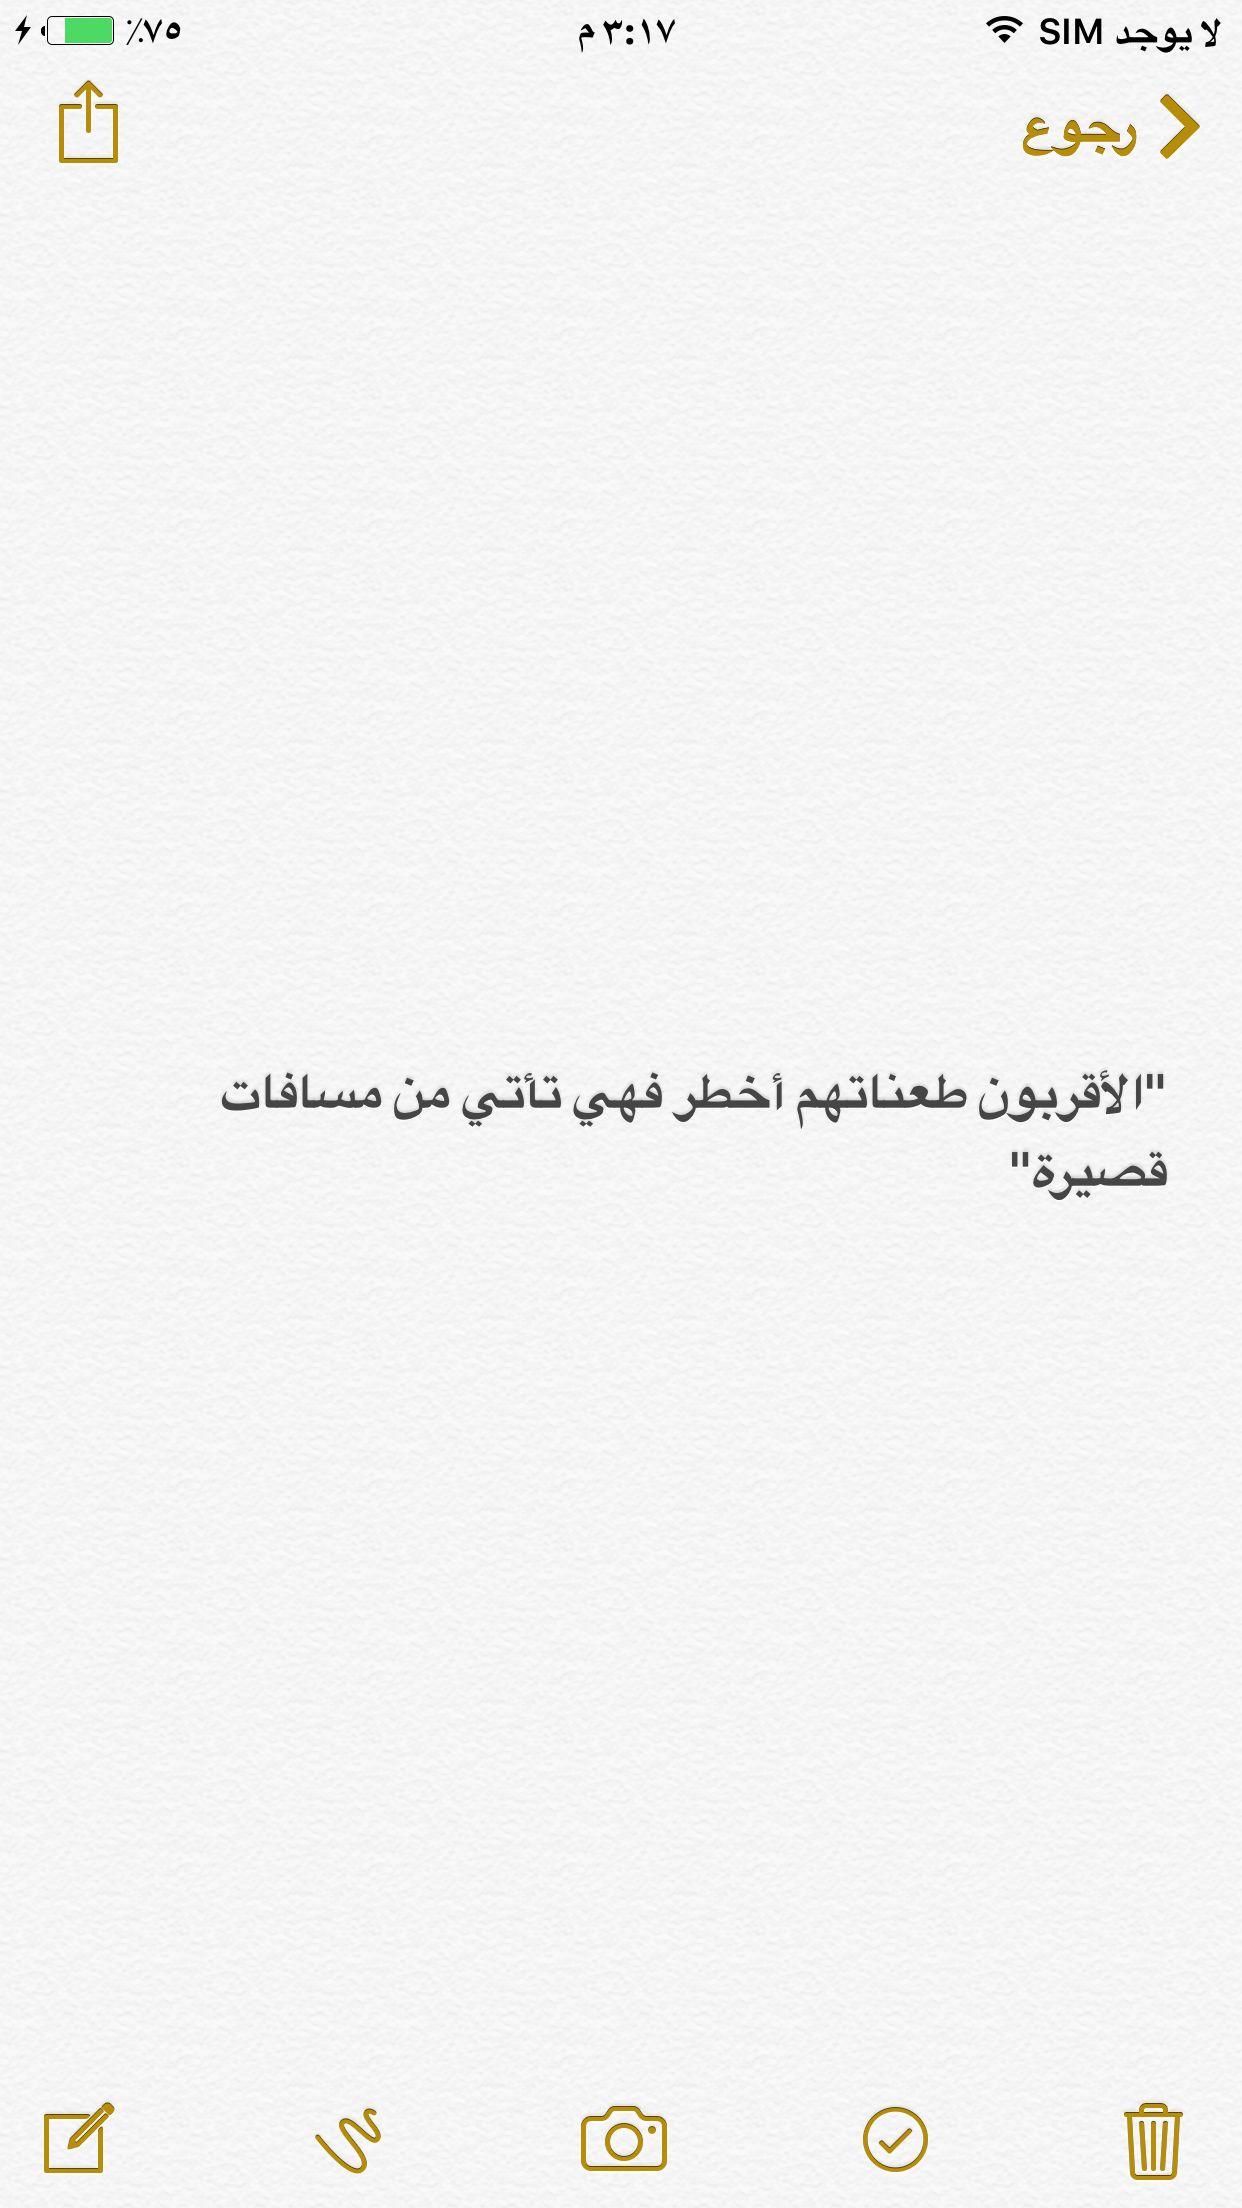 عبارات عميقة Phrase Math Arabic Calligraphy